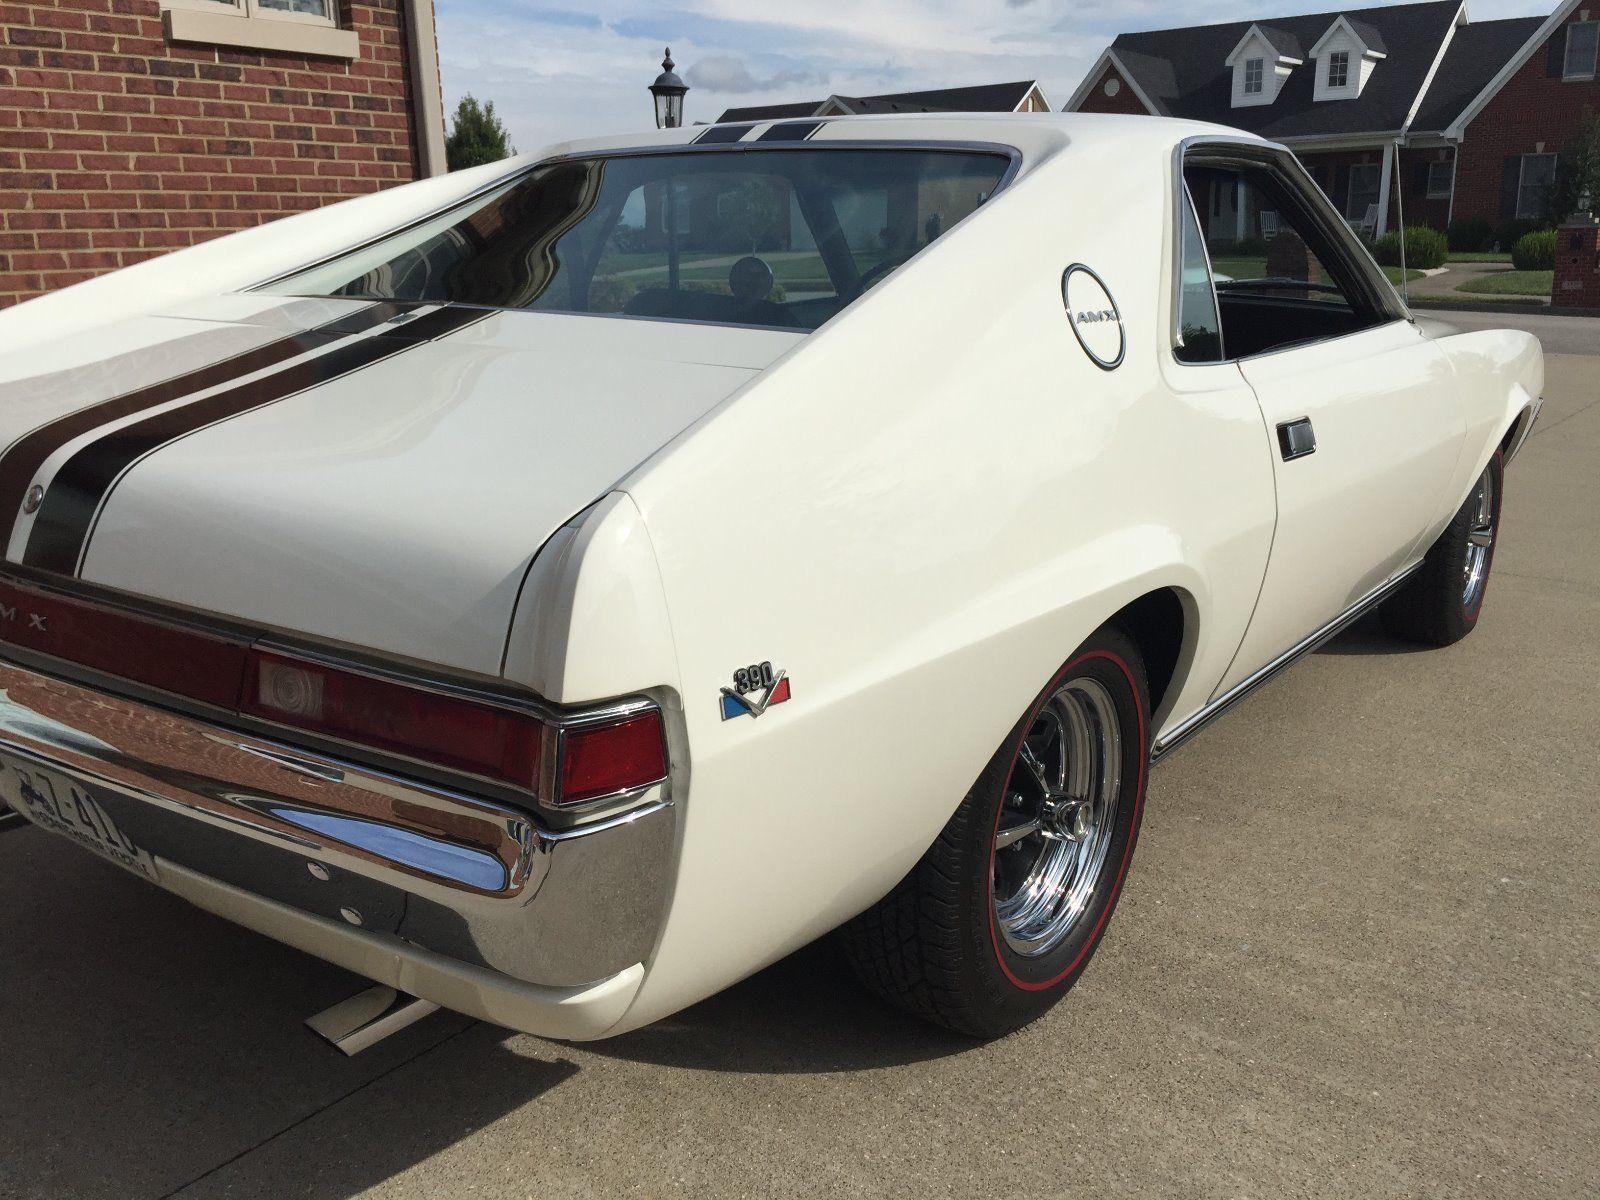 1968 AMX American Motors Muscle Car Muscle Car Monday